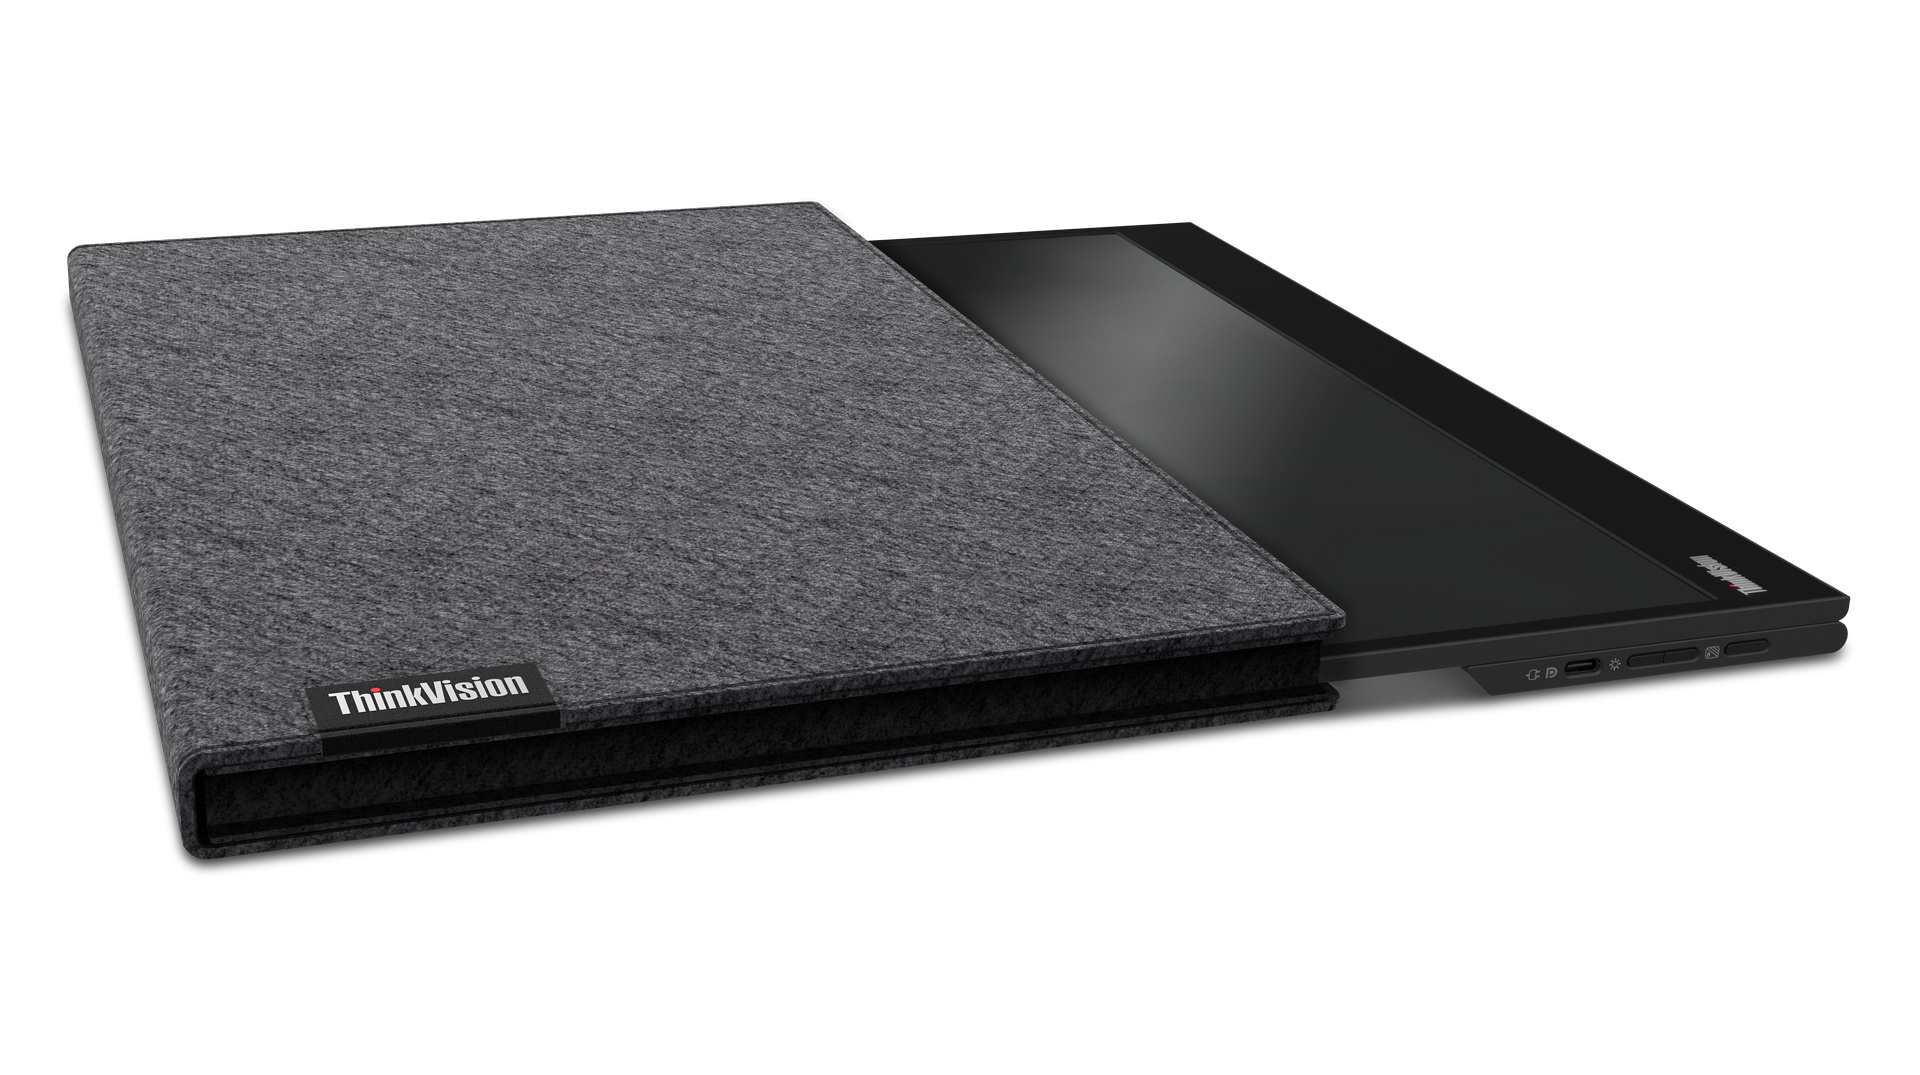 Lenovo ThinkVision M15